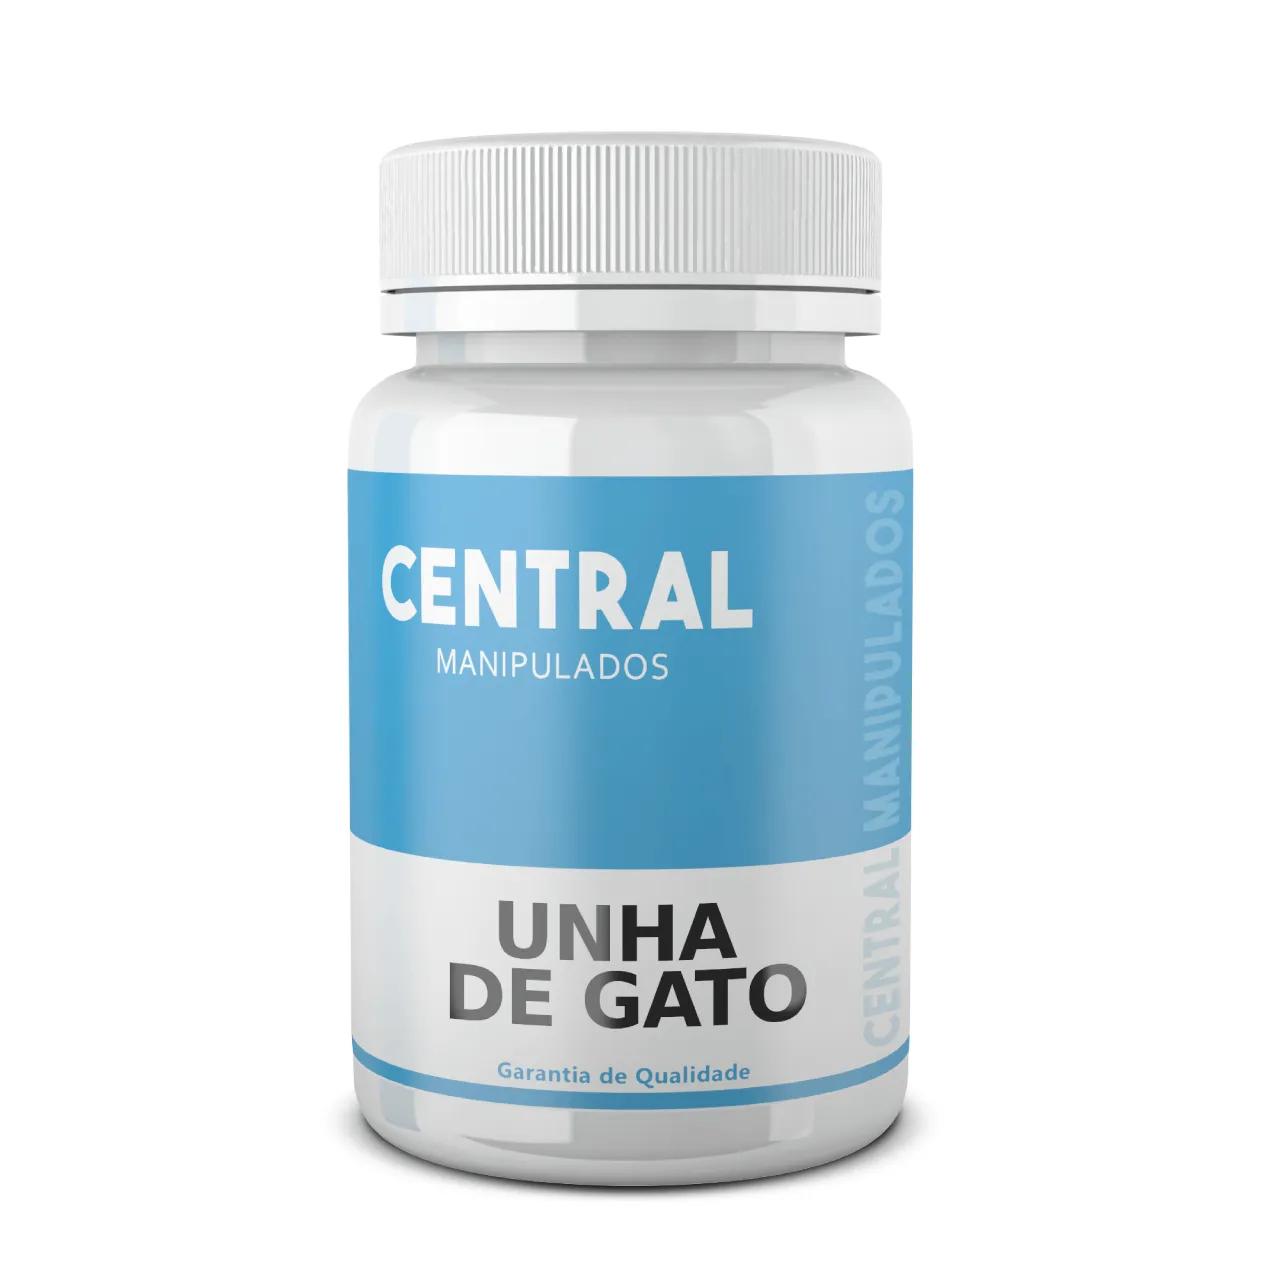 Unha de Gato 500mg - 90 Cápsulas - Reduz a dor da Artrite, Gota, Osteoporose, Reumatismo. Aumenta Imunidade.